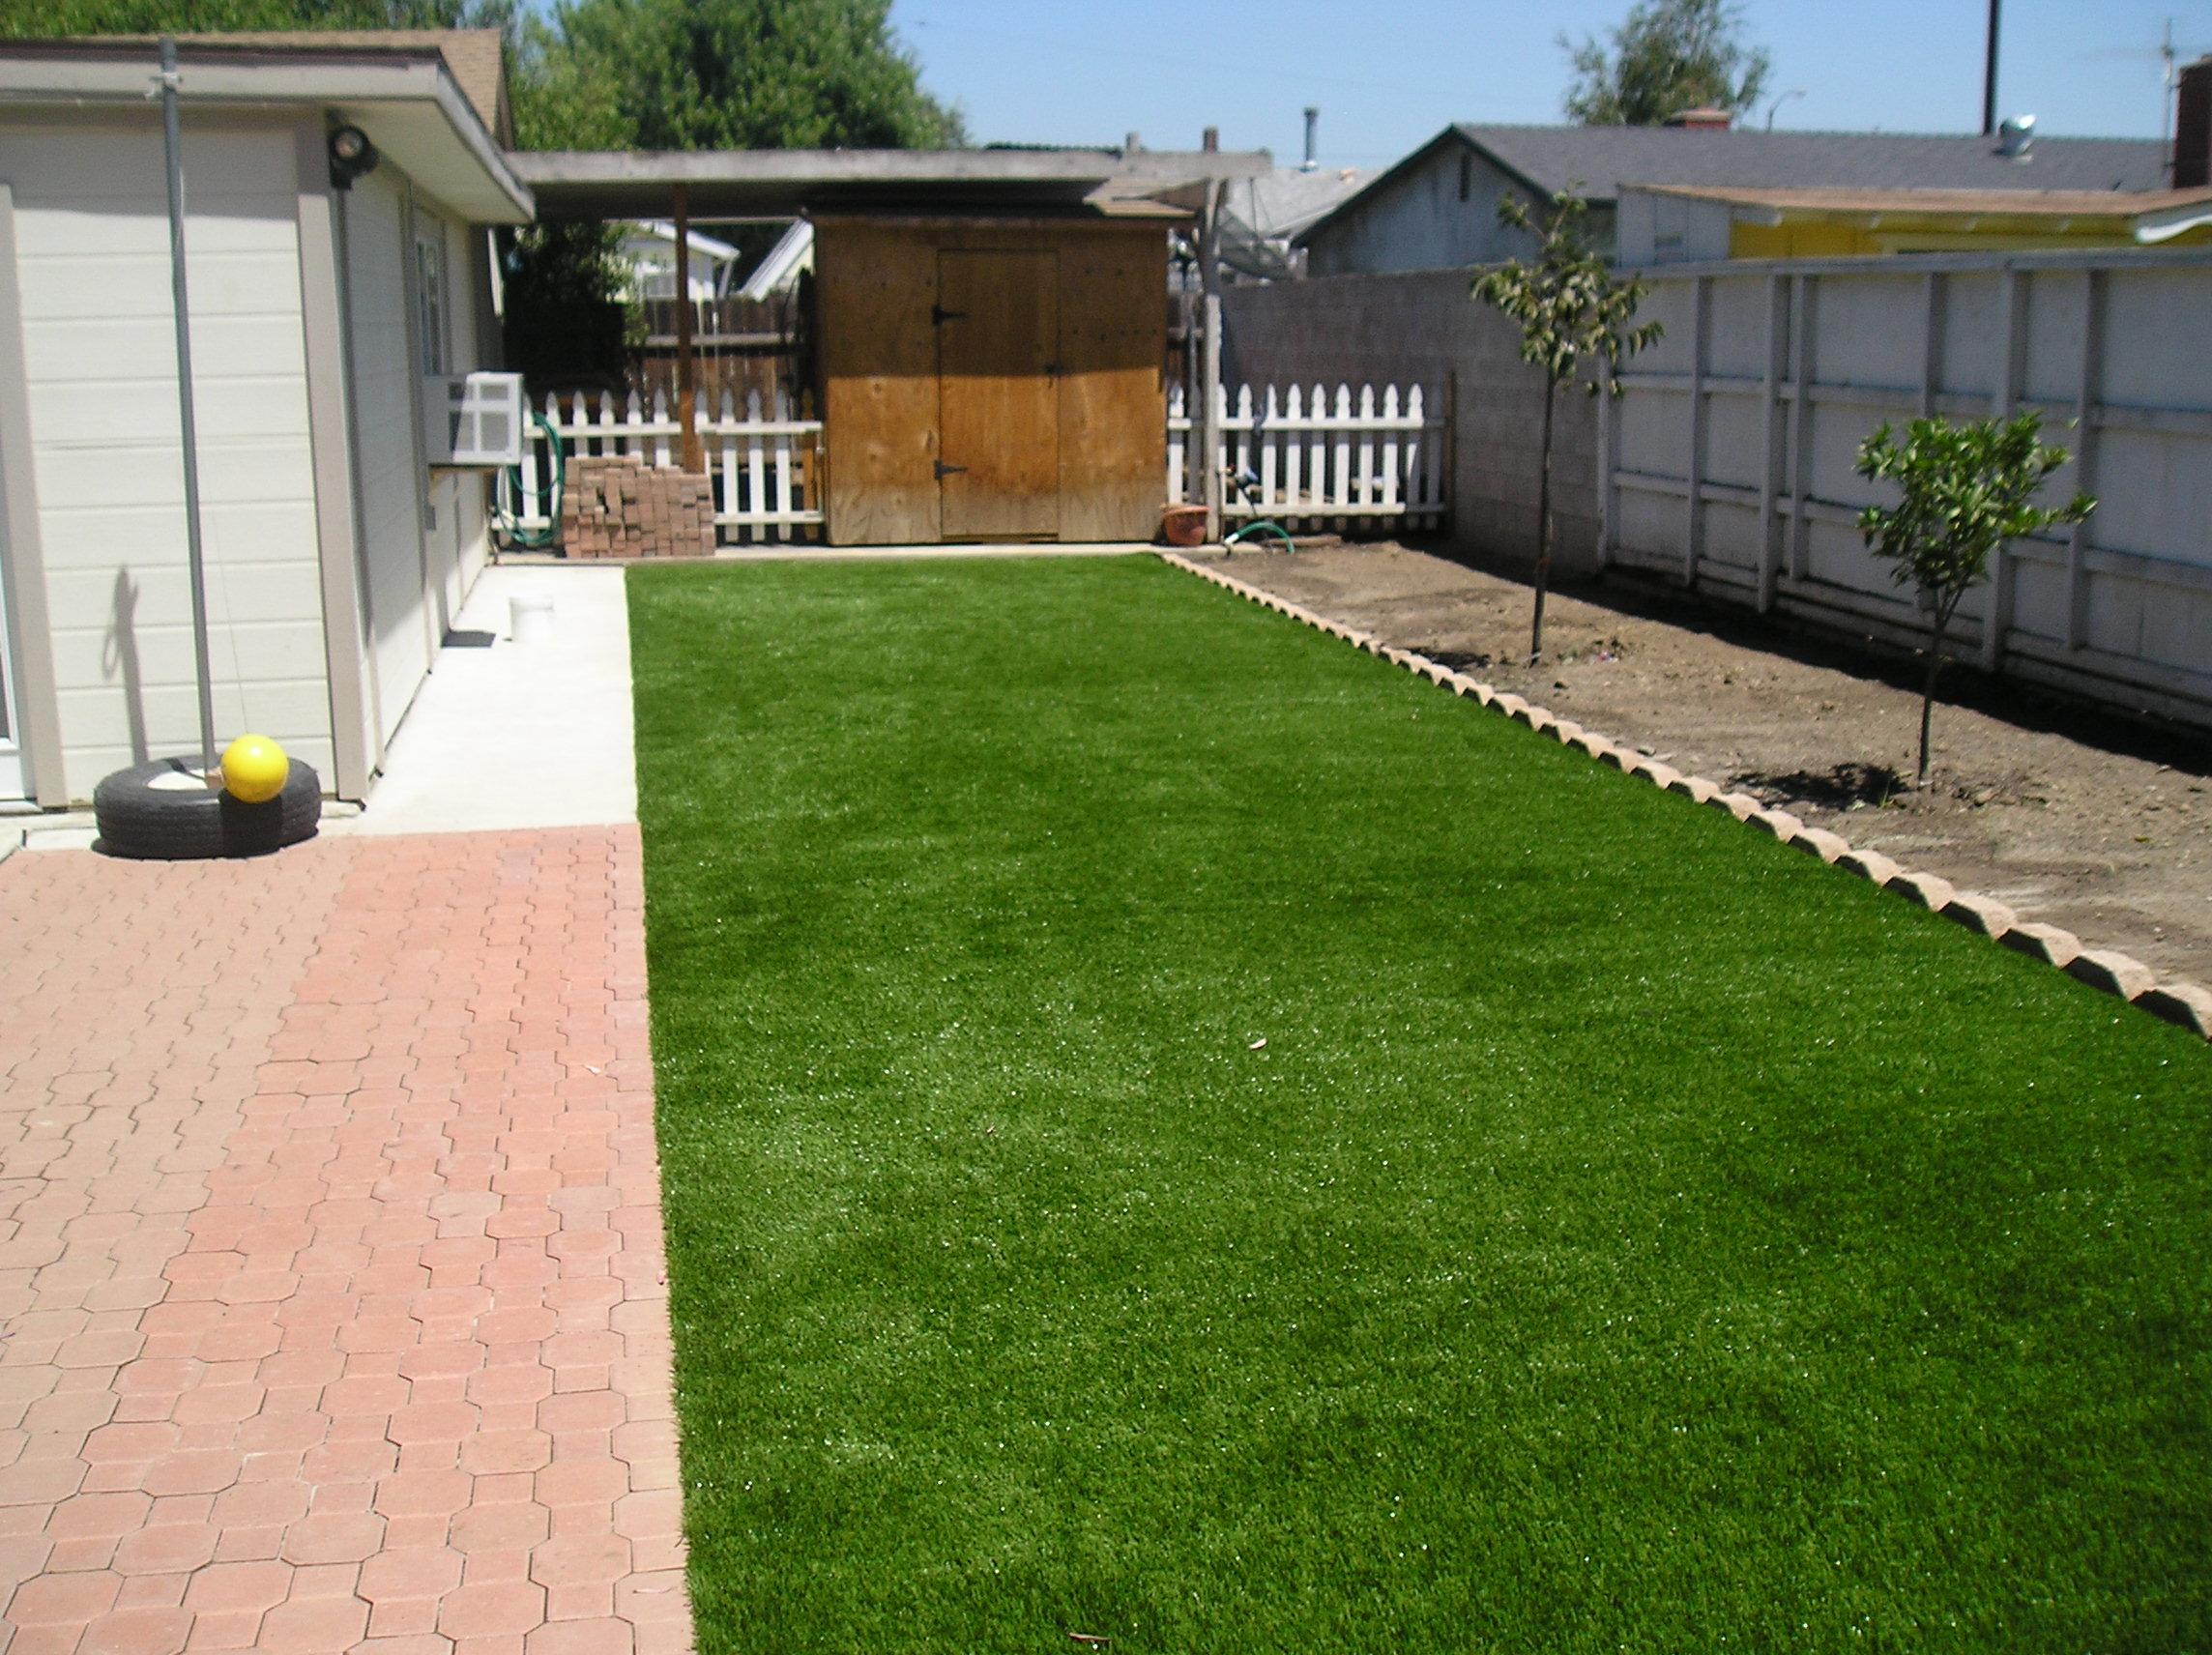 Super Natural 60 plastic grass,plastic grass mats,artificial lawn,synthetic lawn,fake lawn,turf lawn,fake grass lawn